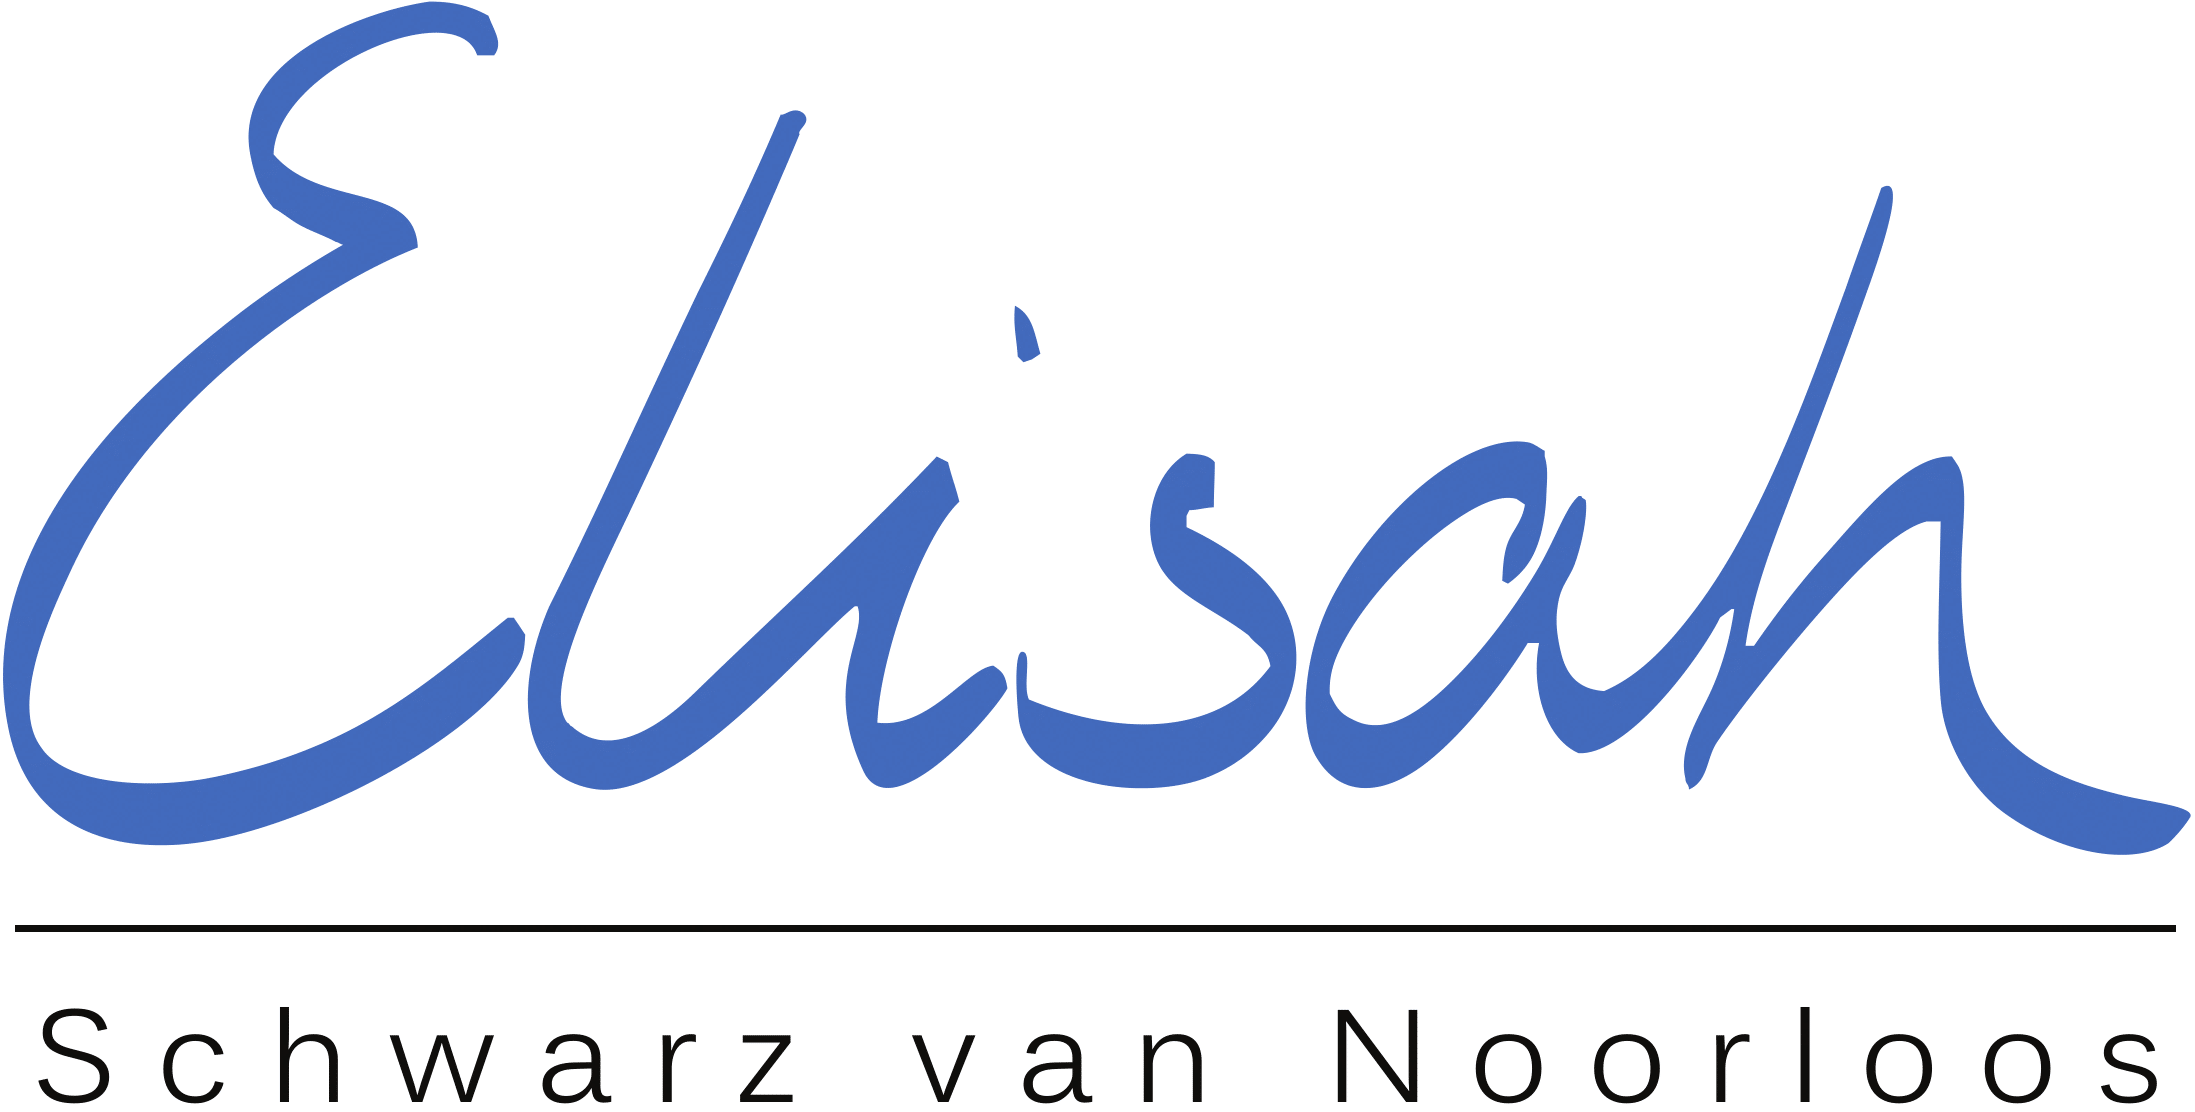 Elisah Schwarz van Noorloos